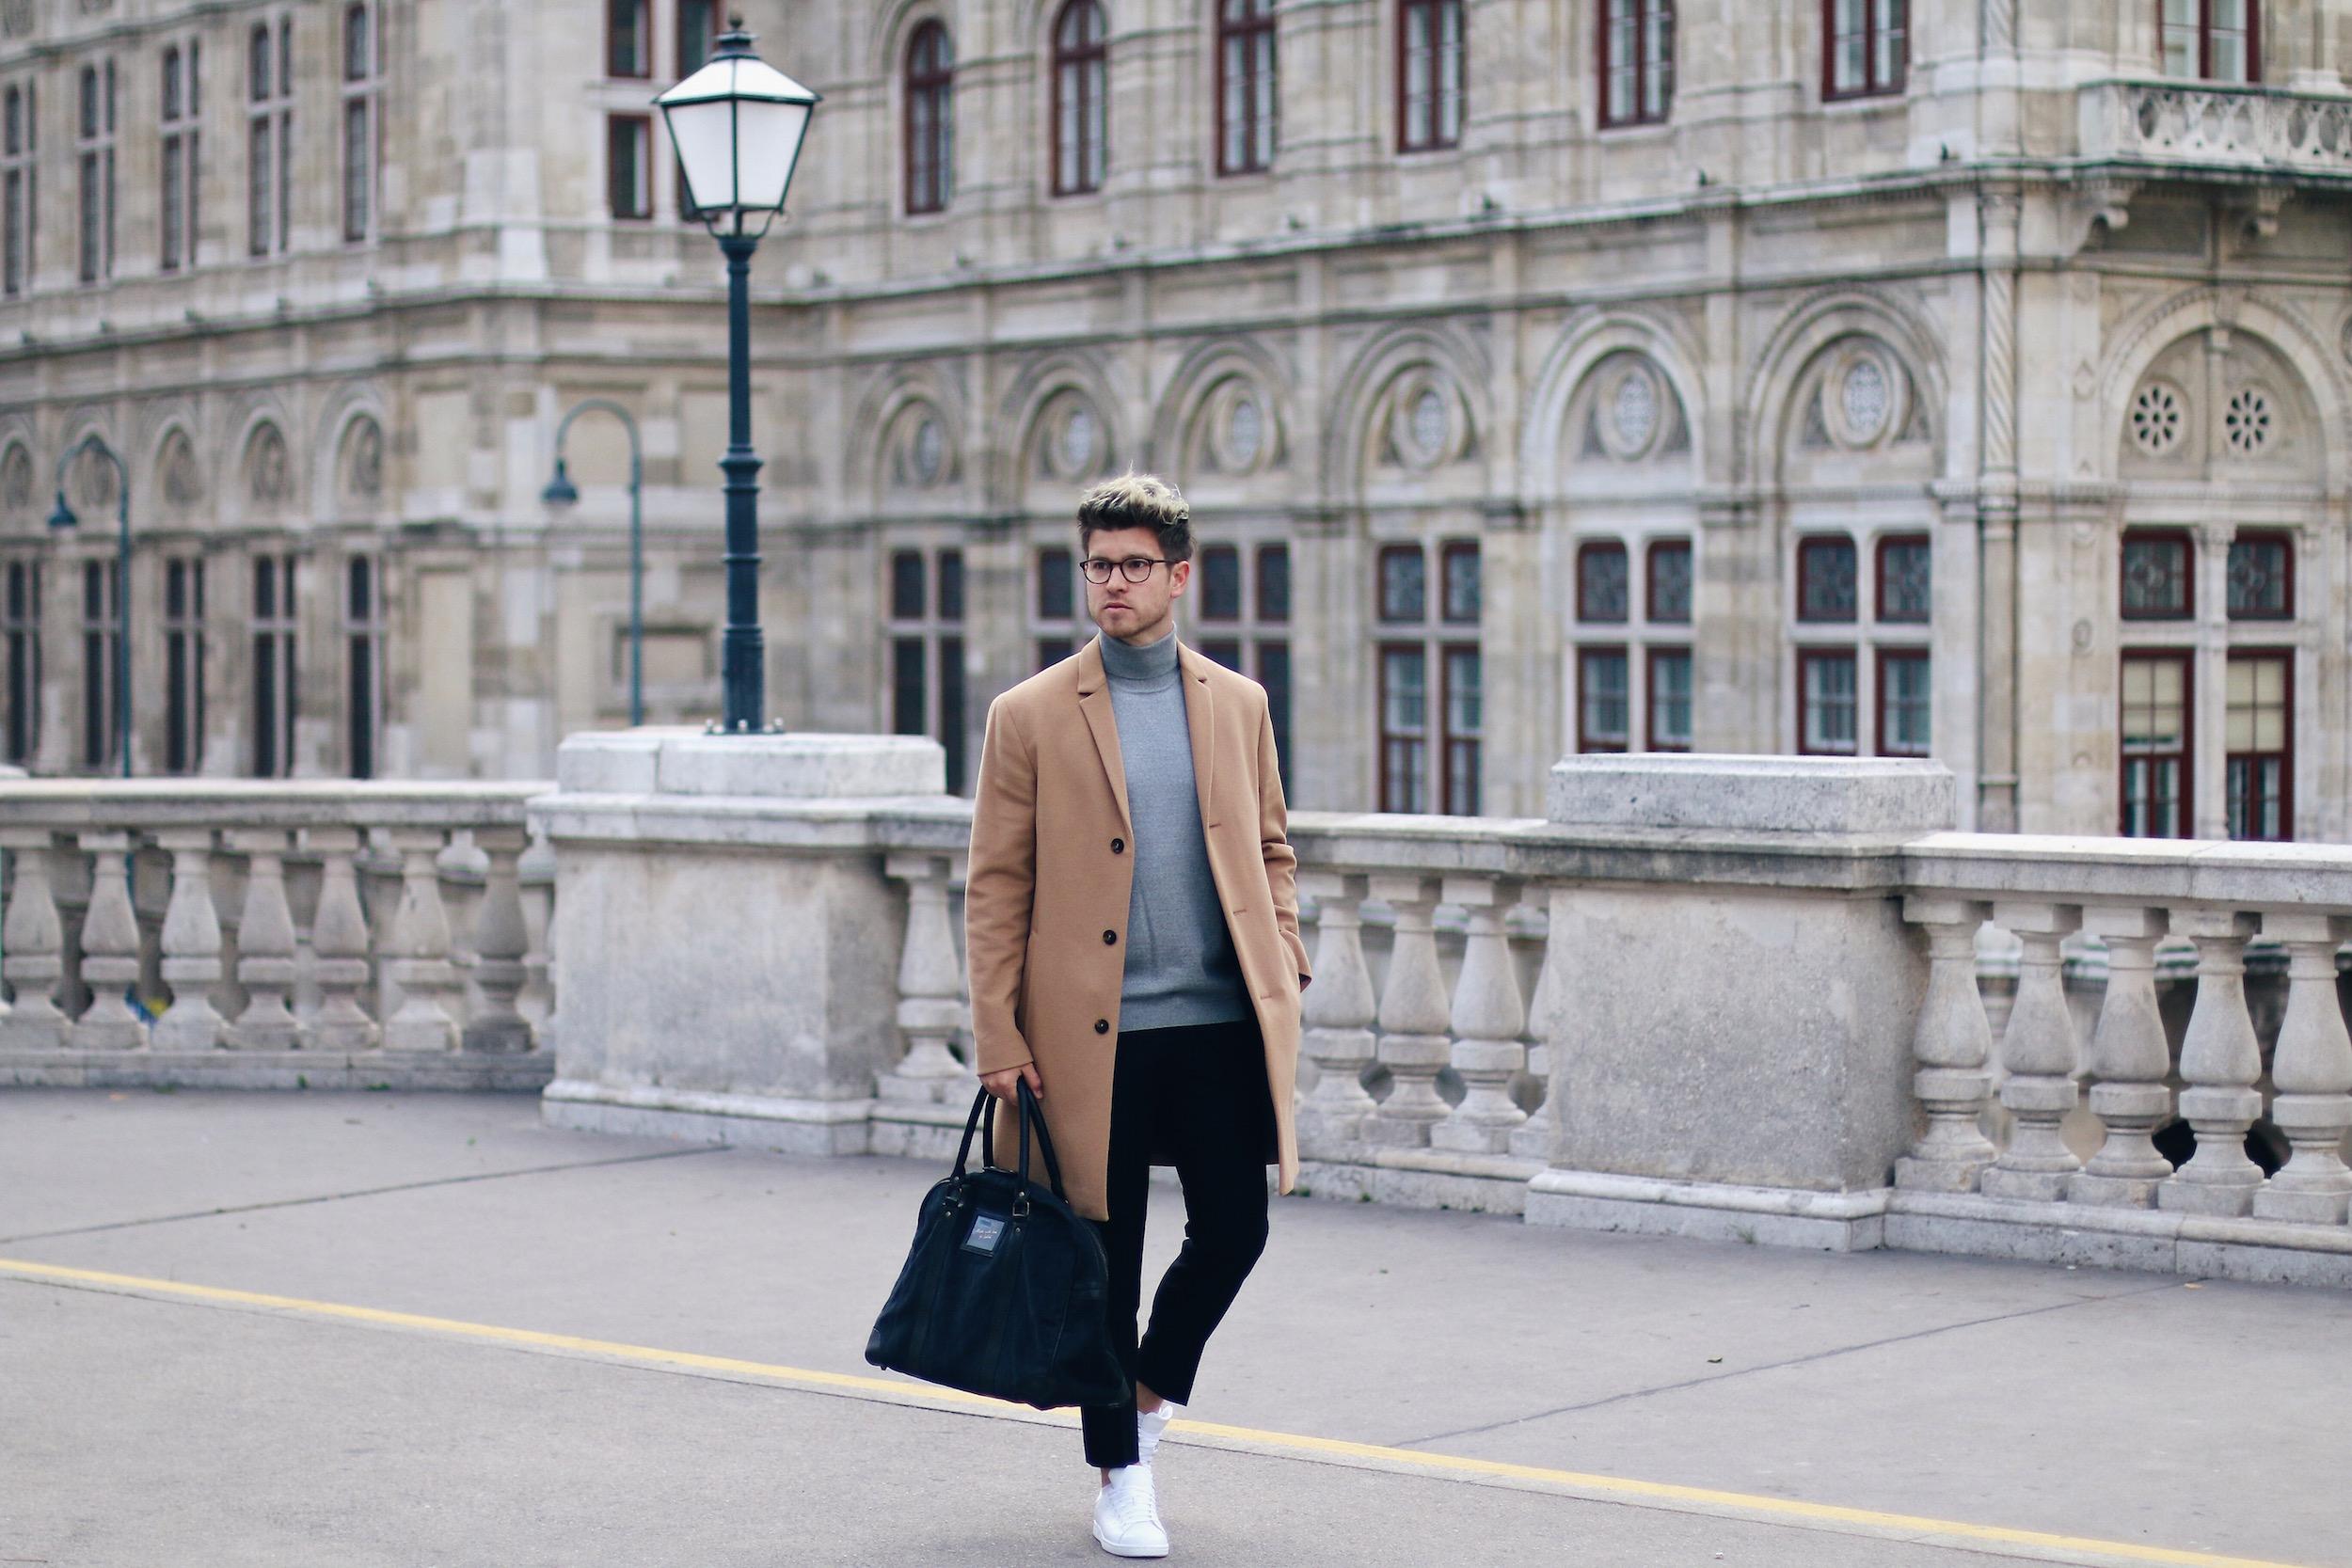 88e679b1a952 The New Peek & Cloppenburg Online Shop | Fall Essentials For Men